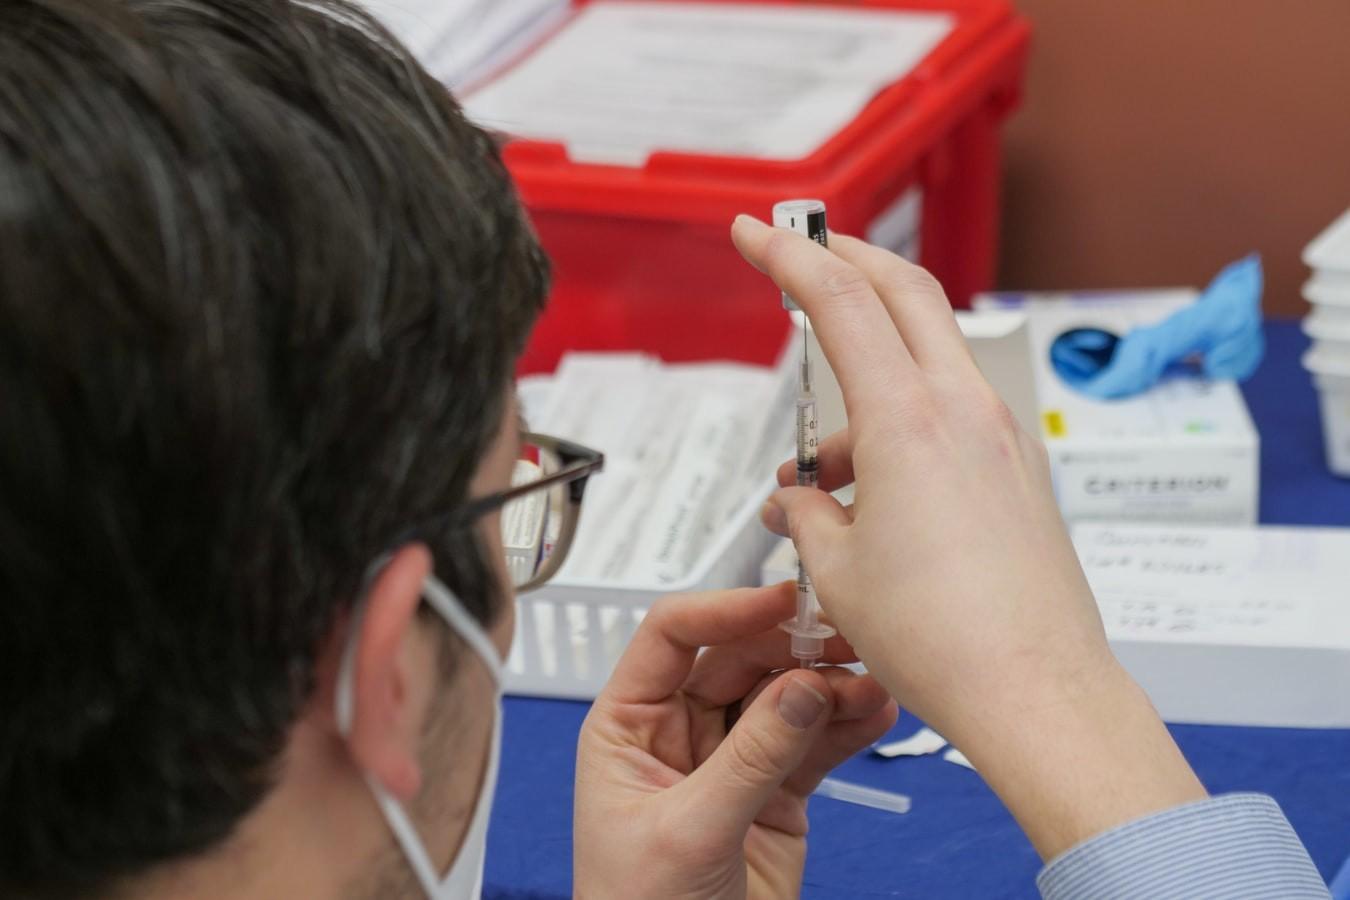 Inoculation ramp-up in Peel looks promising